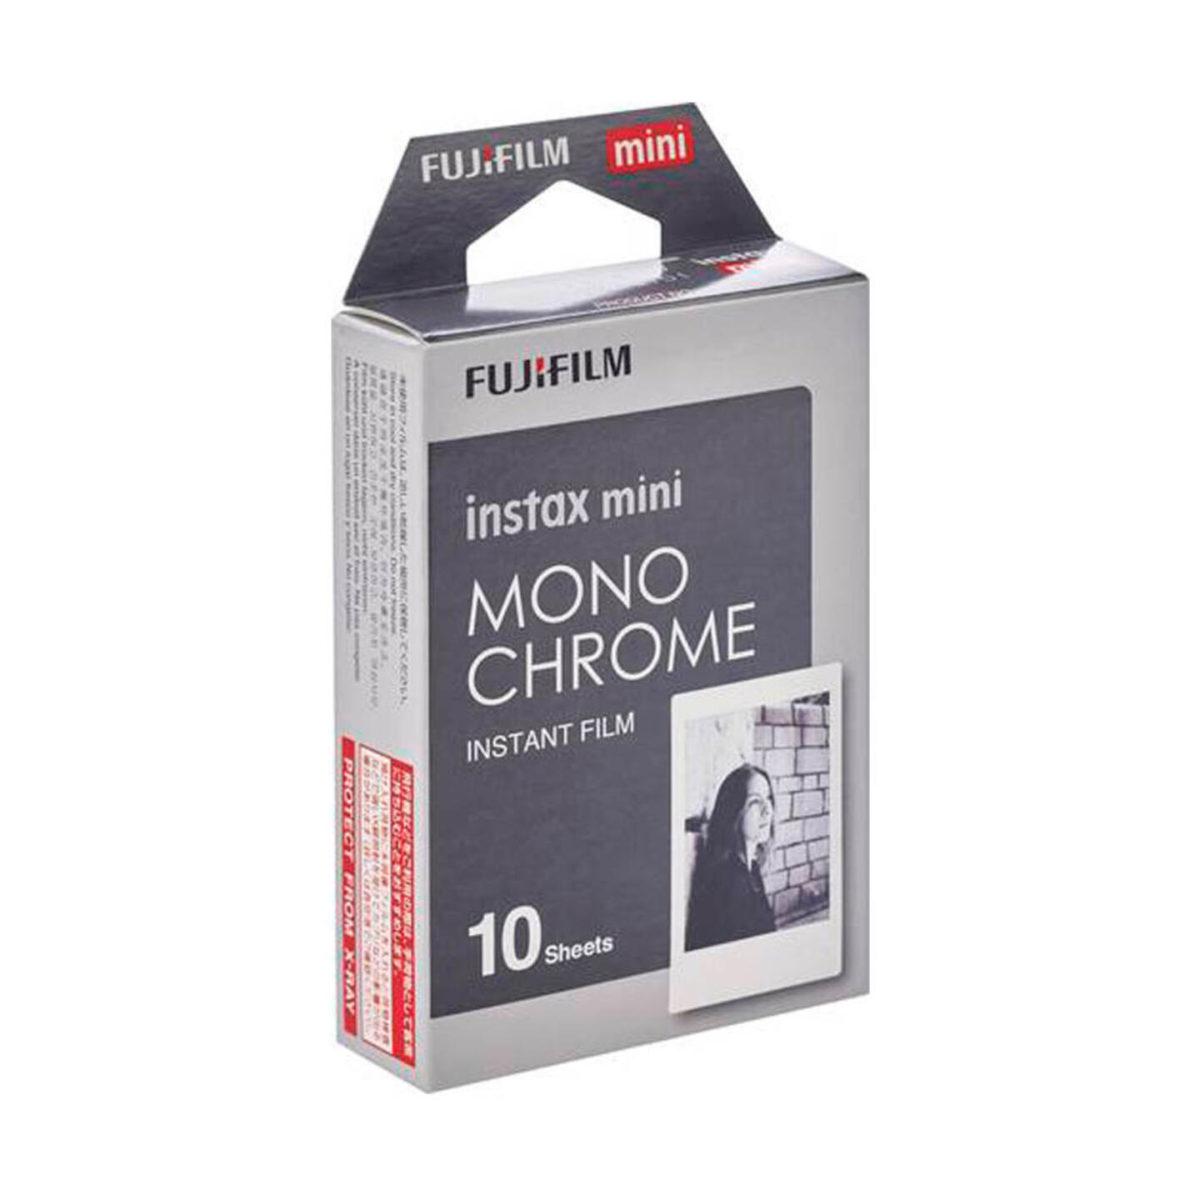 fujifilm_instax_mini_monochrome_02